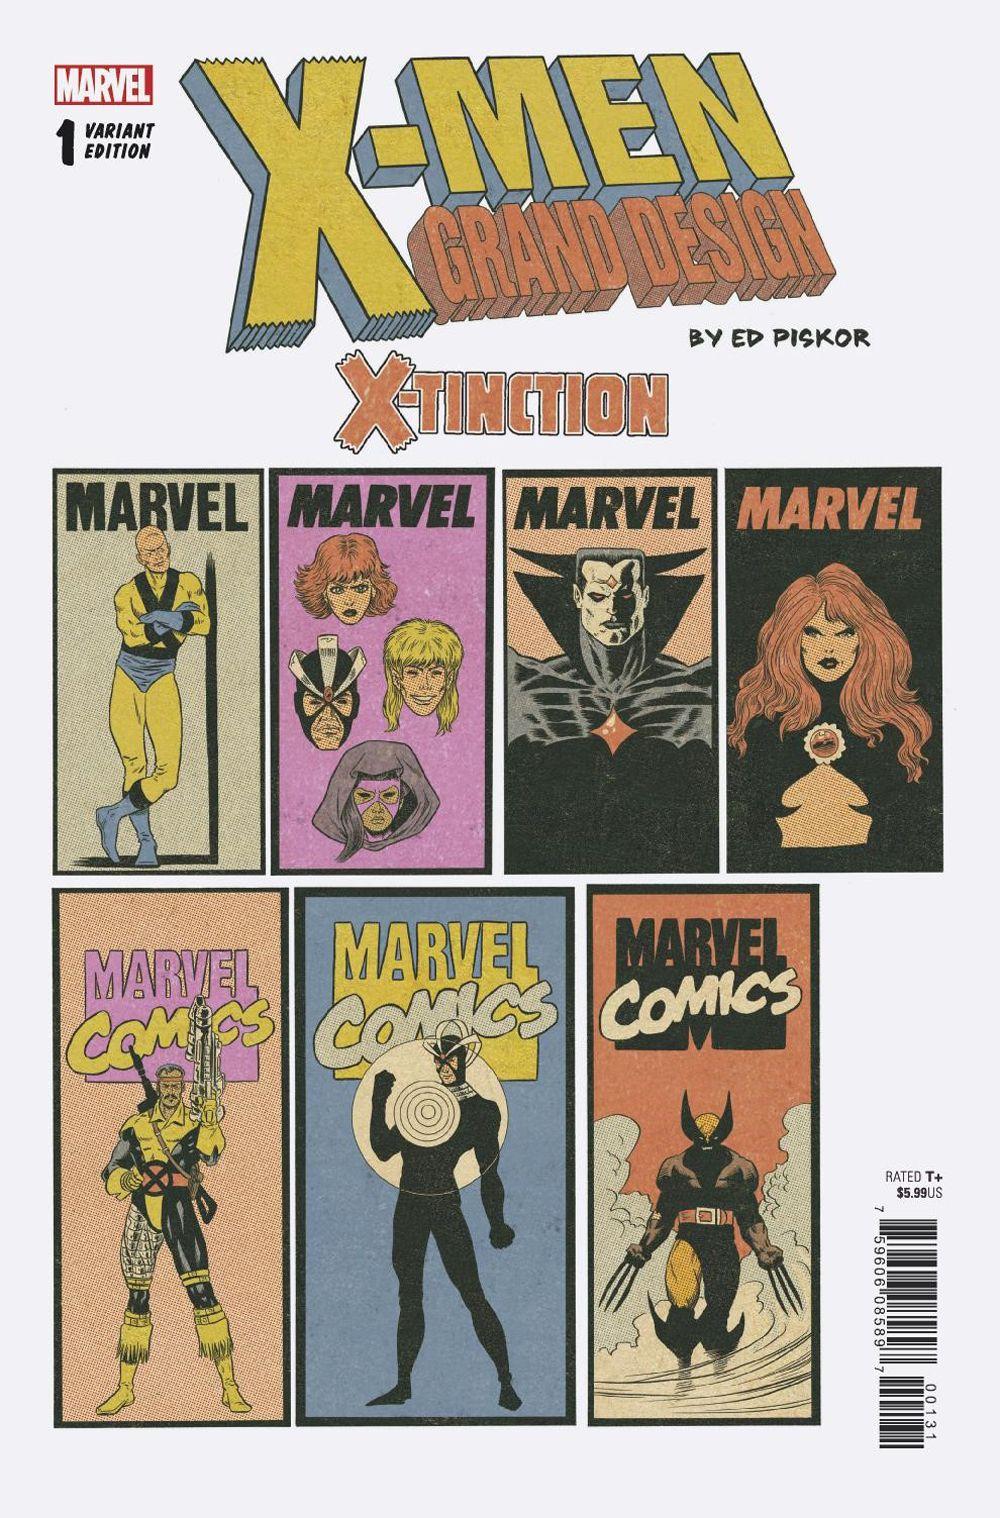 036 4 49 X Men Grand Design X Tinction 1 Corner Box Variant Marvel 2019 Nm Sold By Imagine That Comics Https Imaginethatcomics Com Product X Men